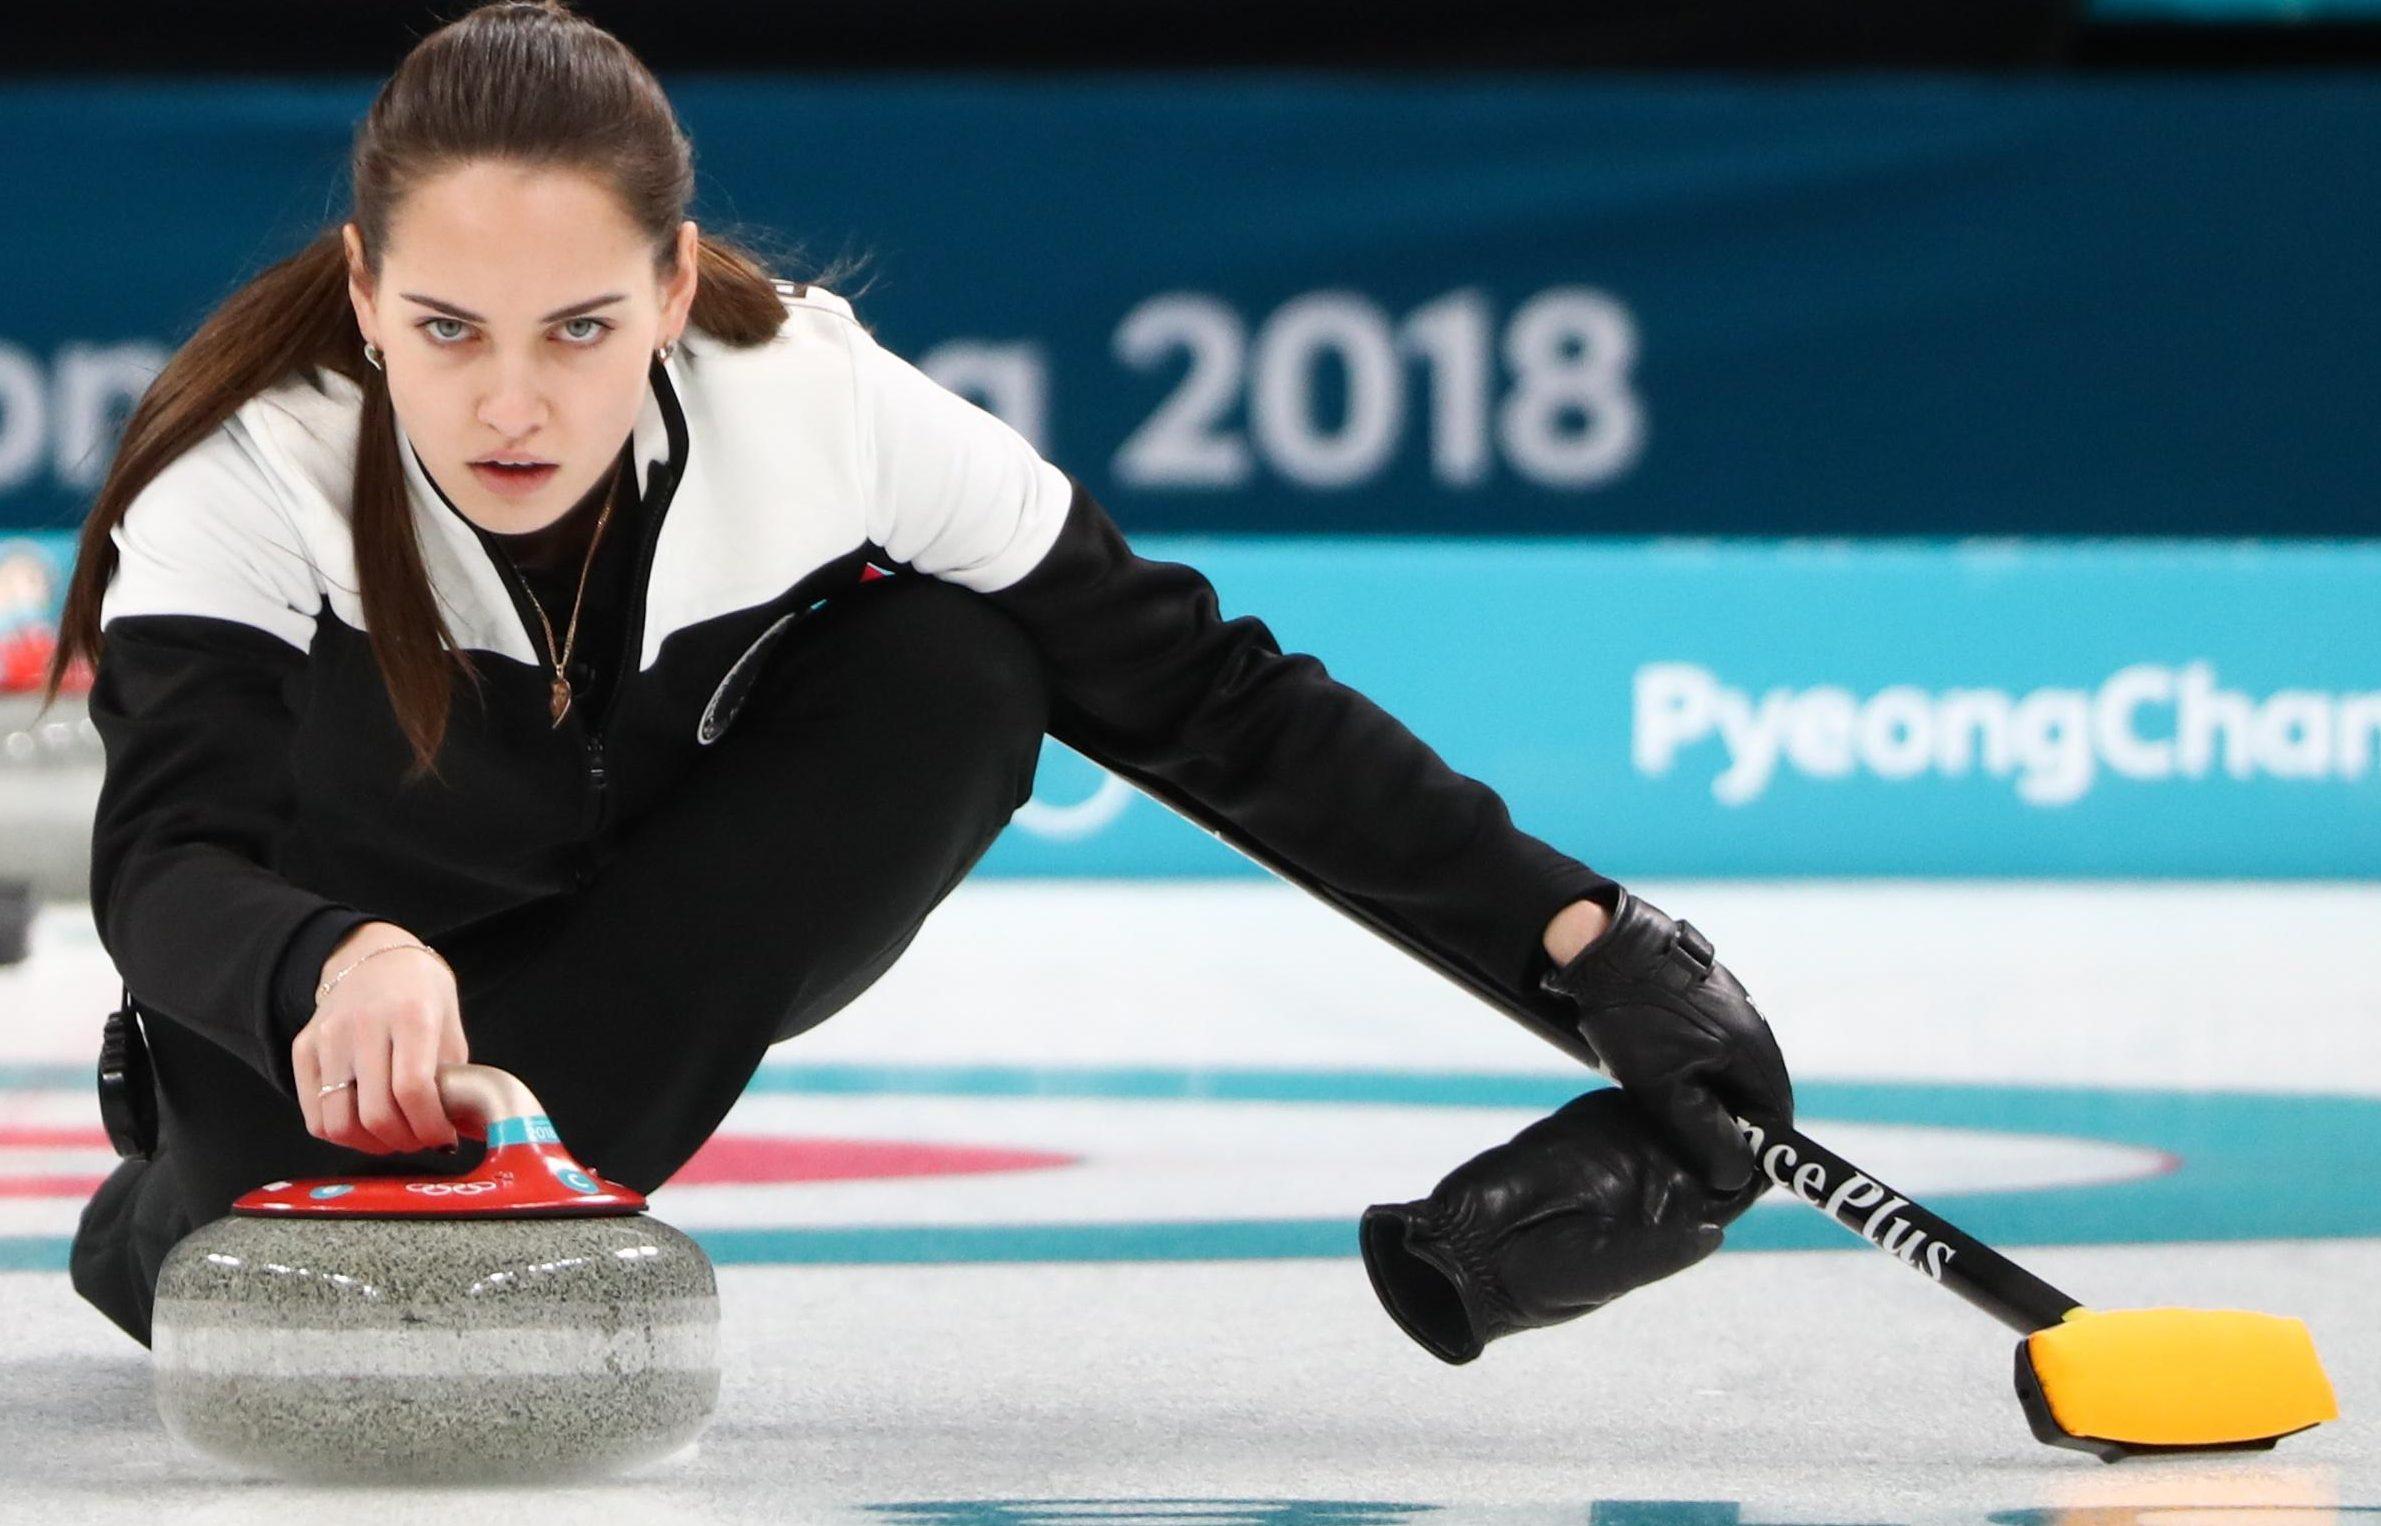 Anastasia Bryzgalova must pay the penalty for her husband's misdemeanour